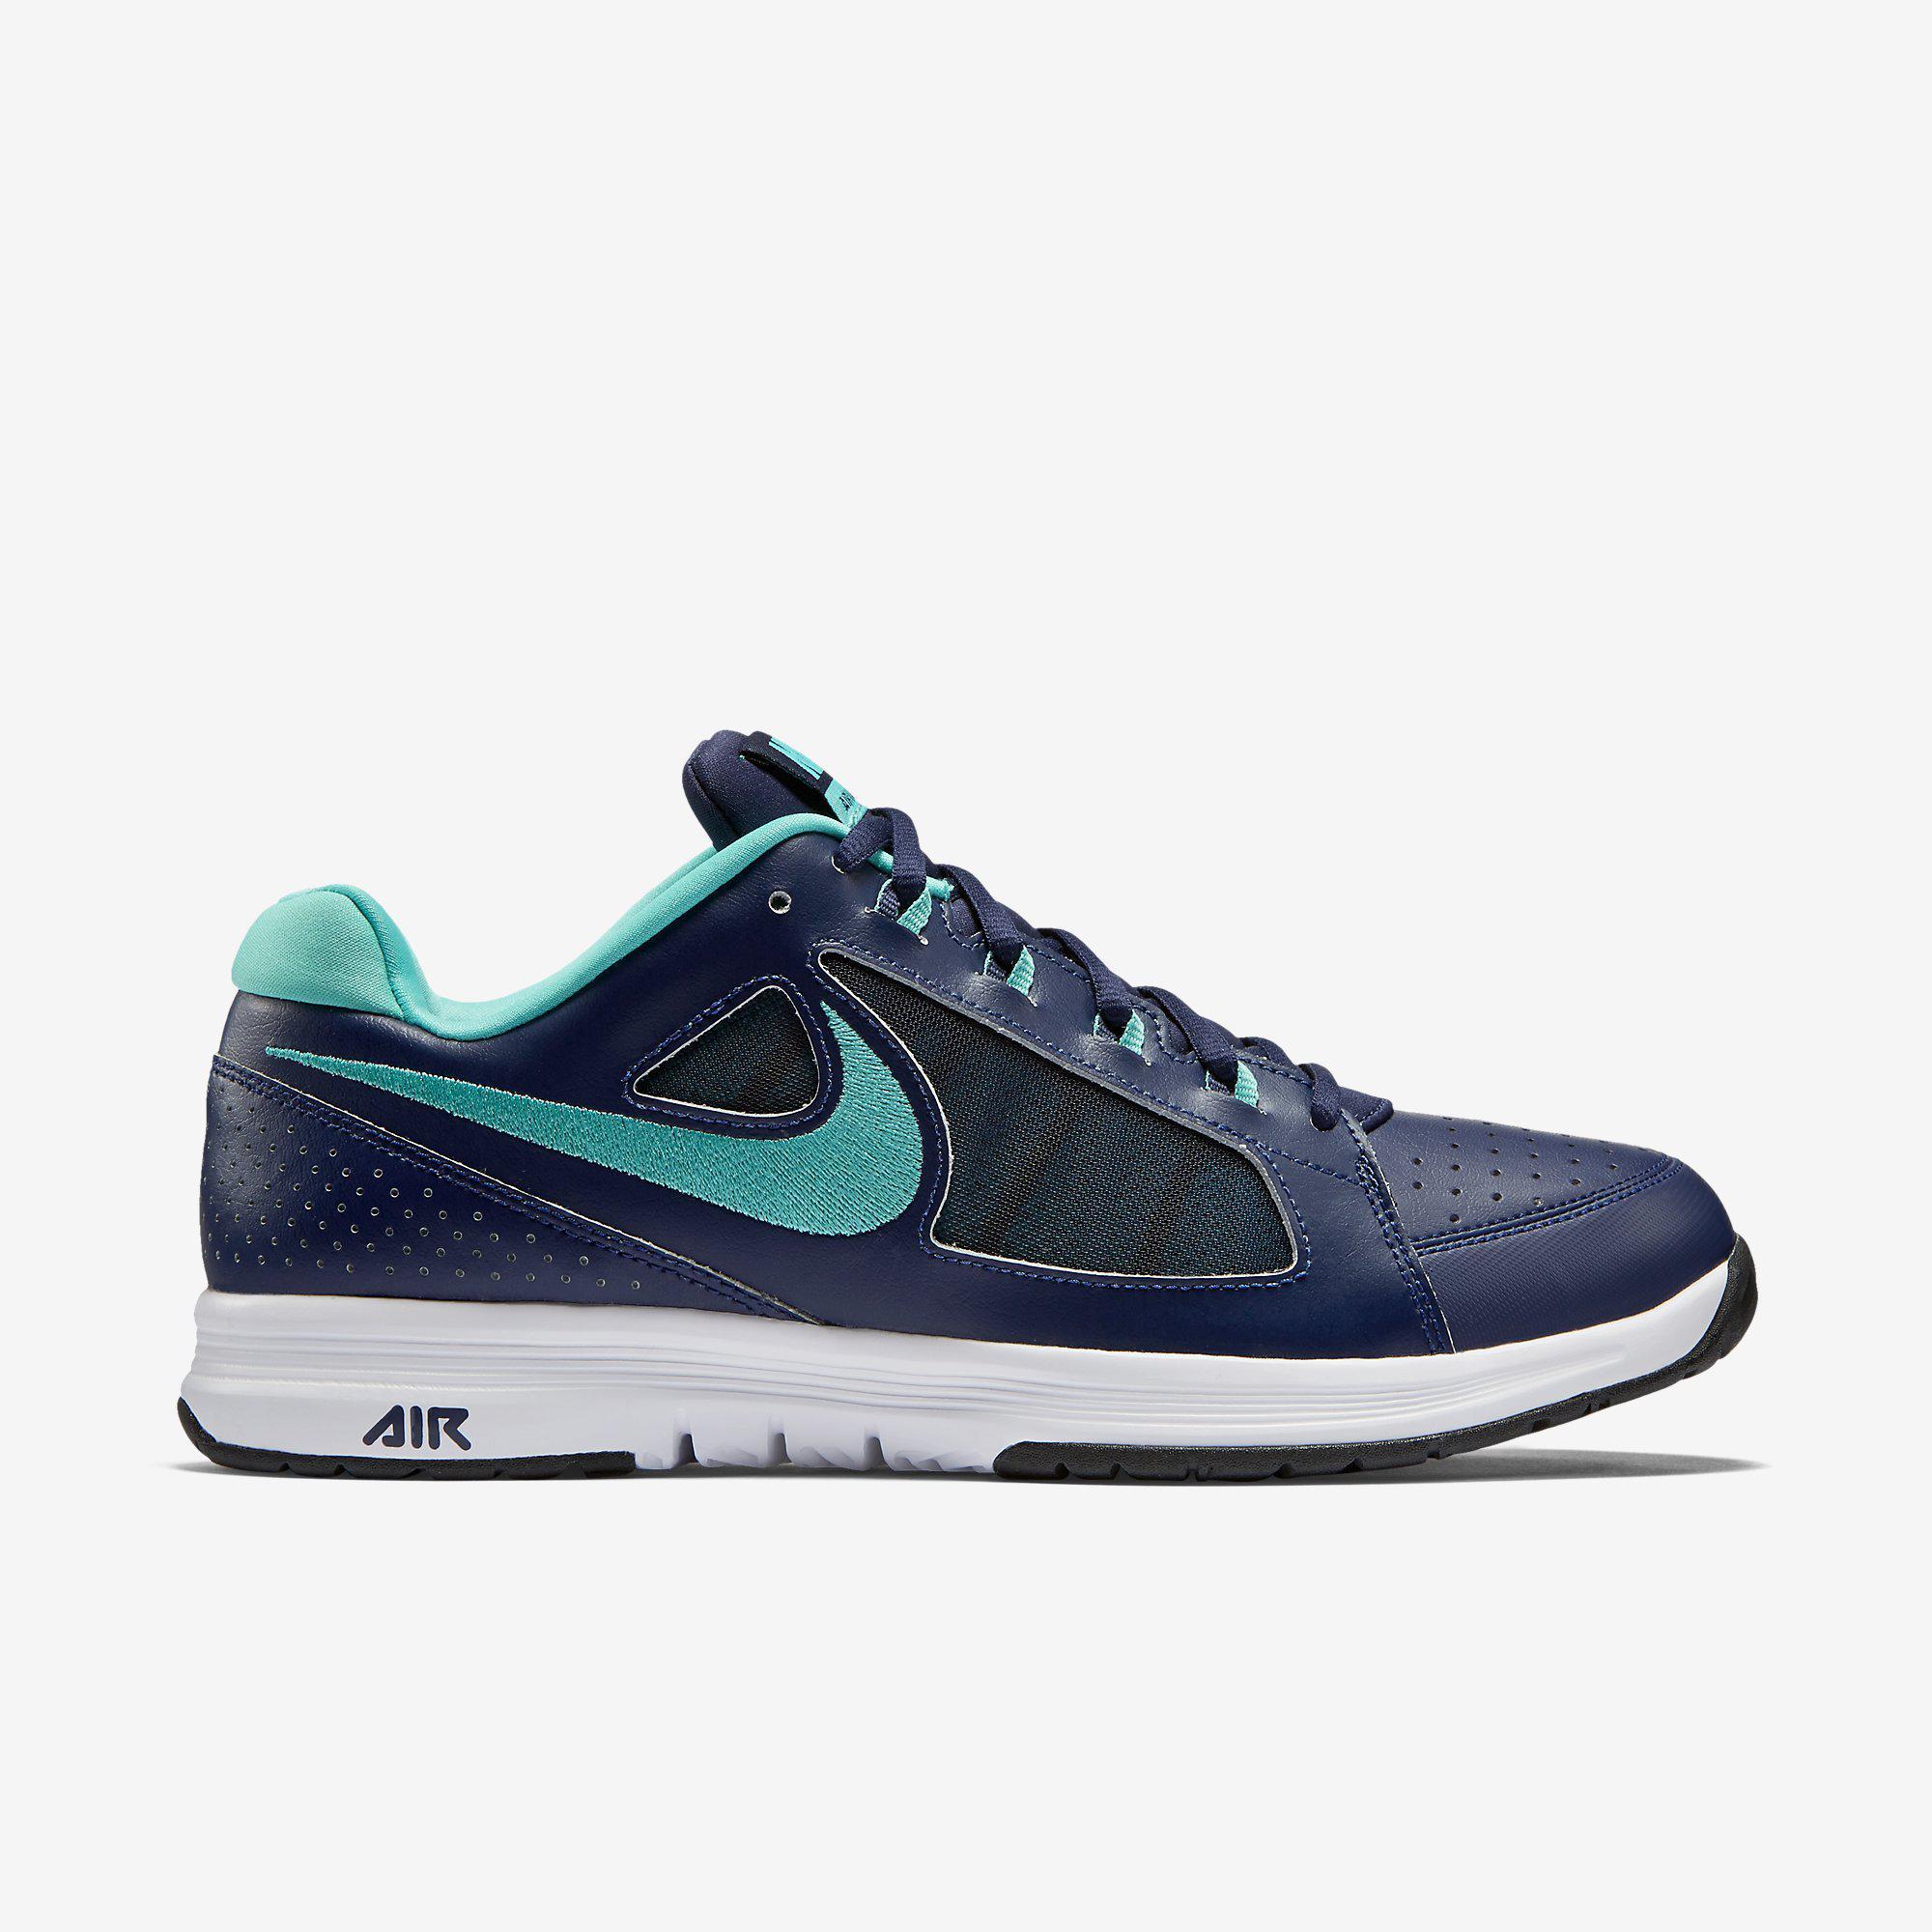 Nike Mens Air Vapor Ace Tennis Shoes Midnight NavyLight Retro